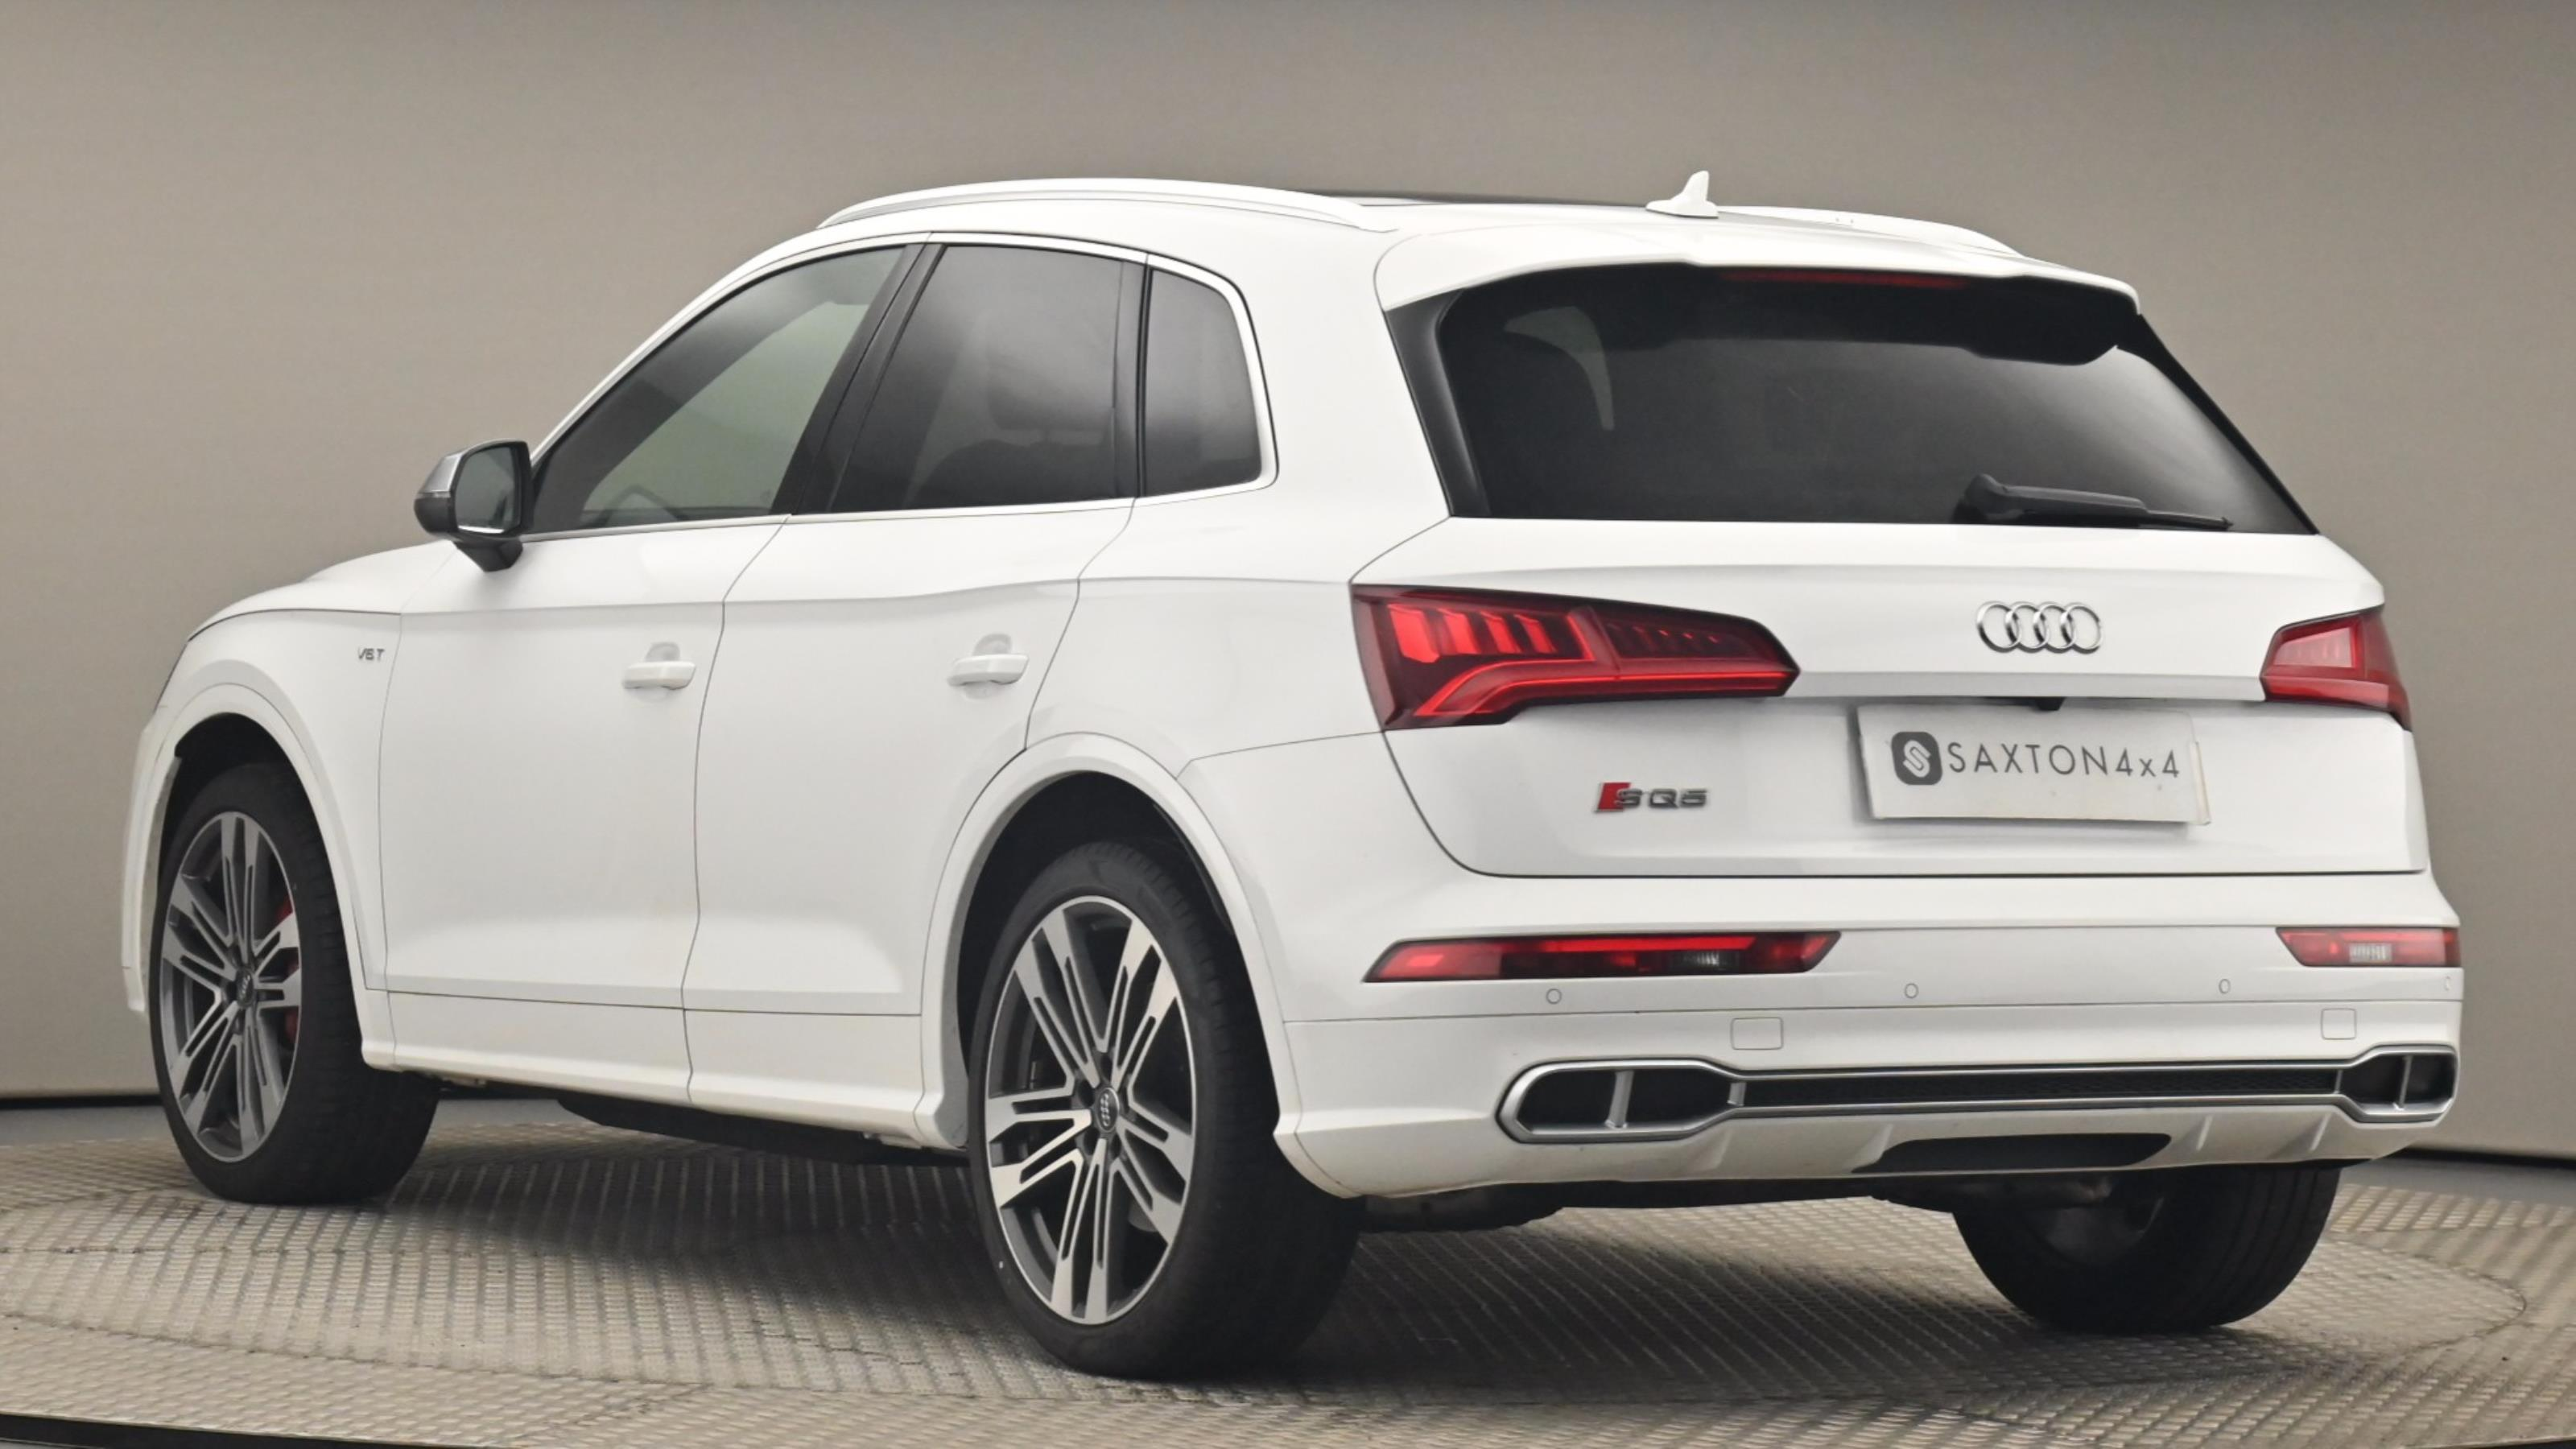 Used 2017 Audi Q5 SQ5 Quattro 5dr Tip Auto WHITE at Saxton4x4